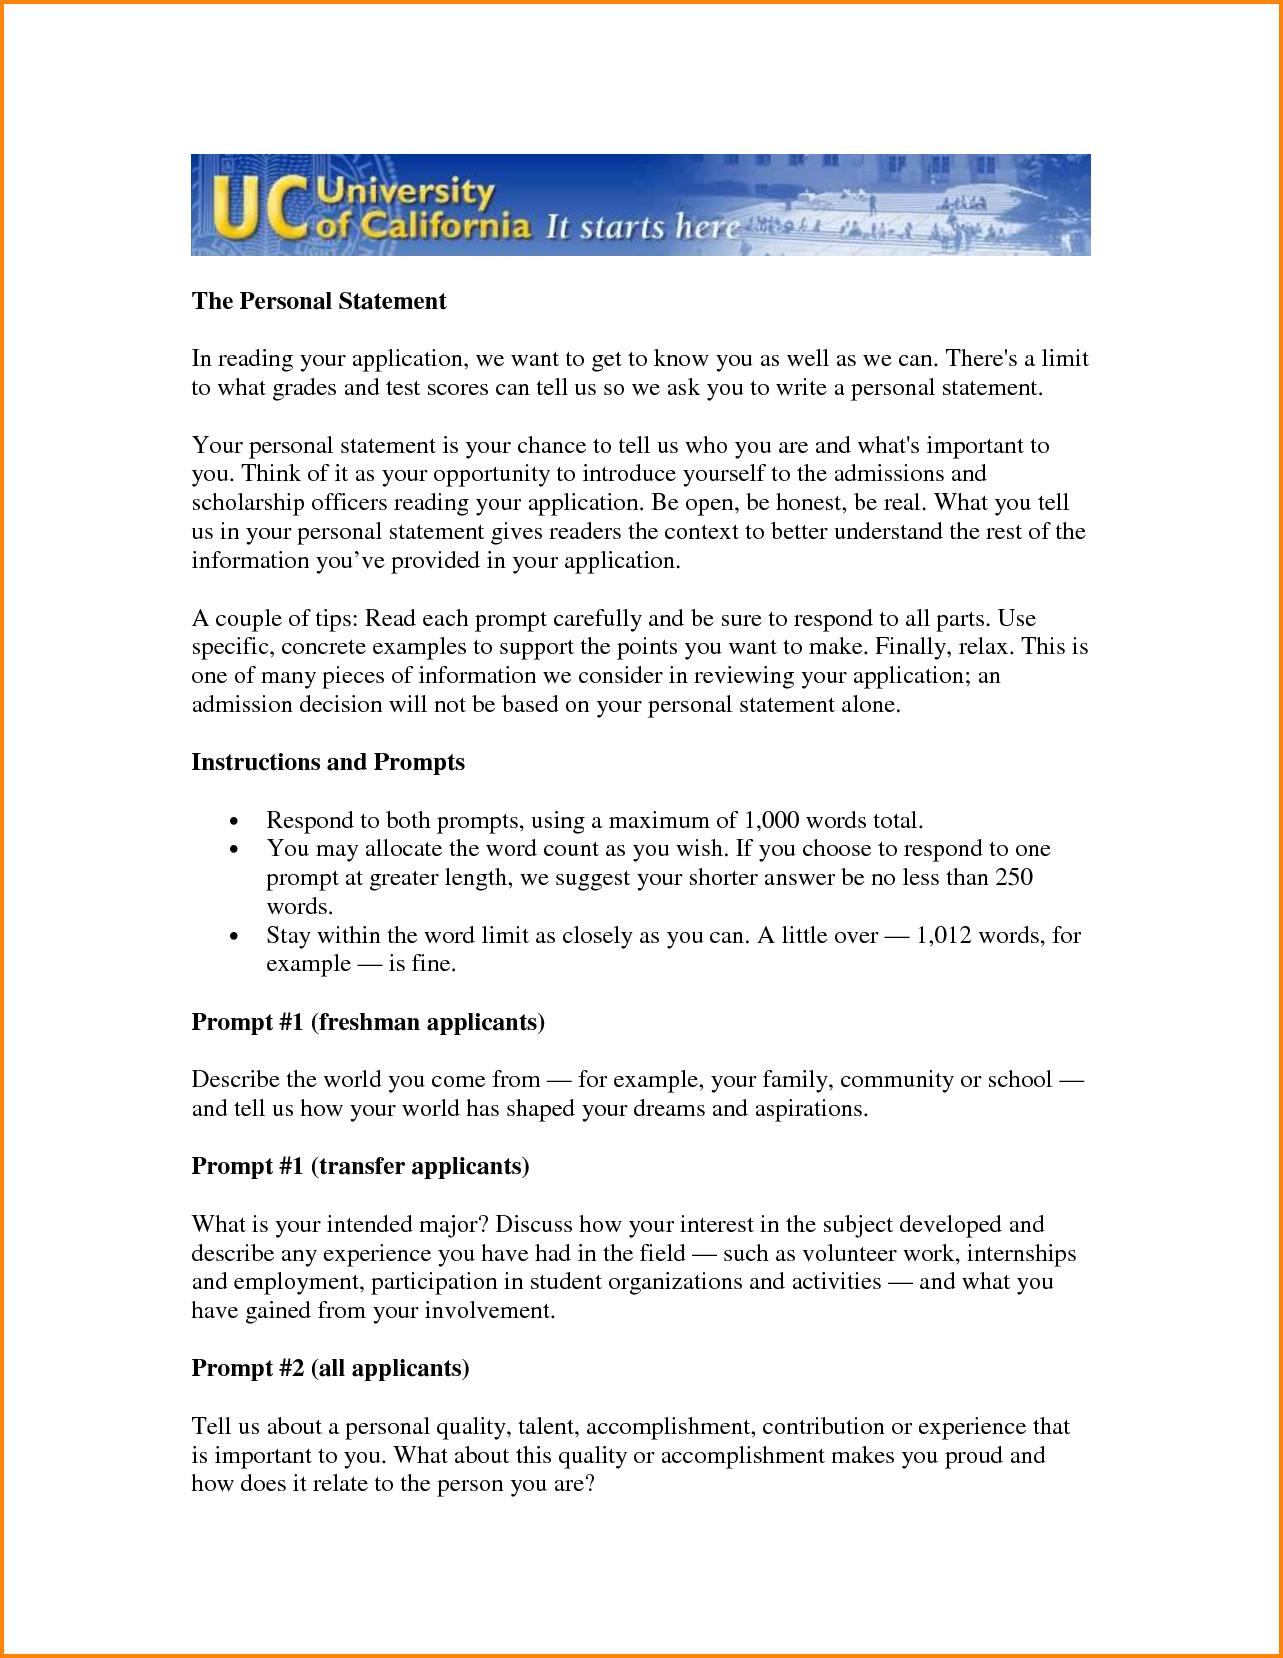 016 Uc Essay Prompt Application Prompts Davis College Personal Statement Guy Berkeleys Imposing 2016-17 Examples 1 Berkeley 2017 Full